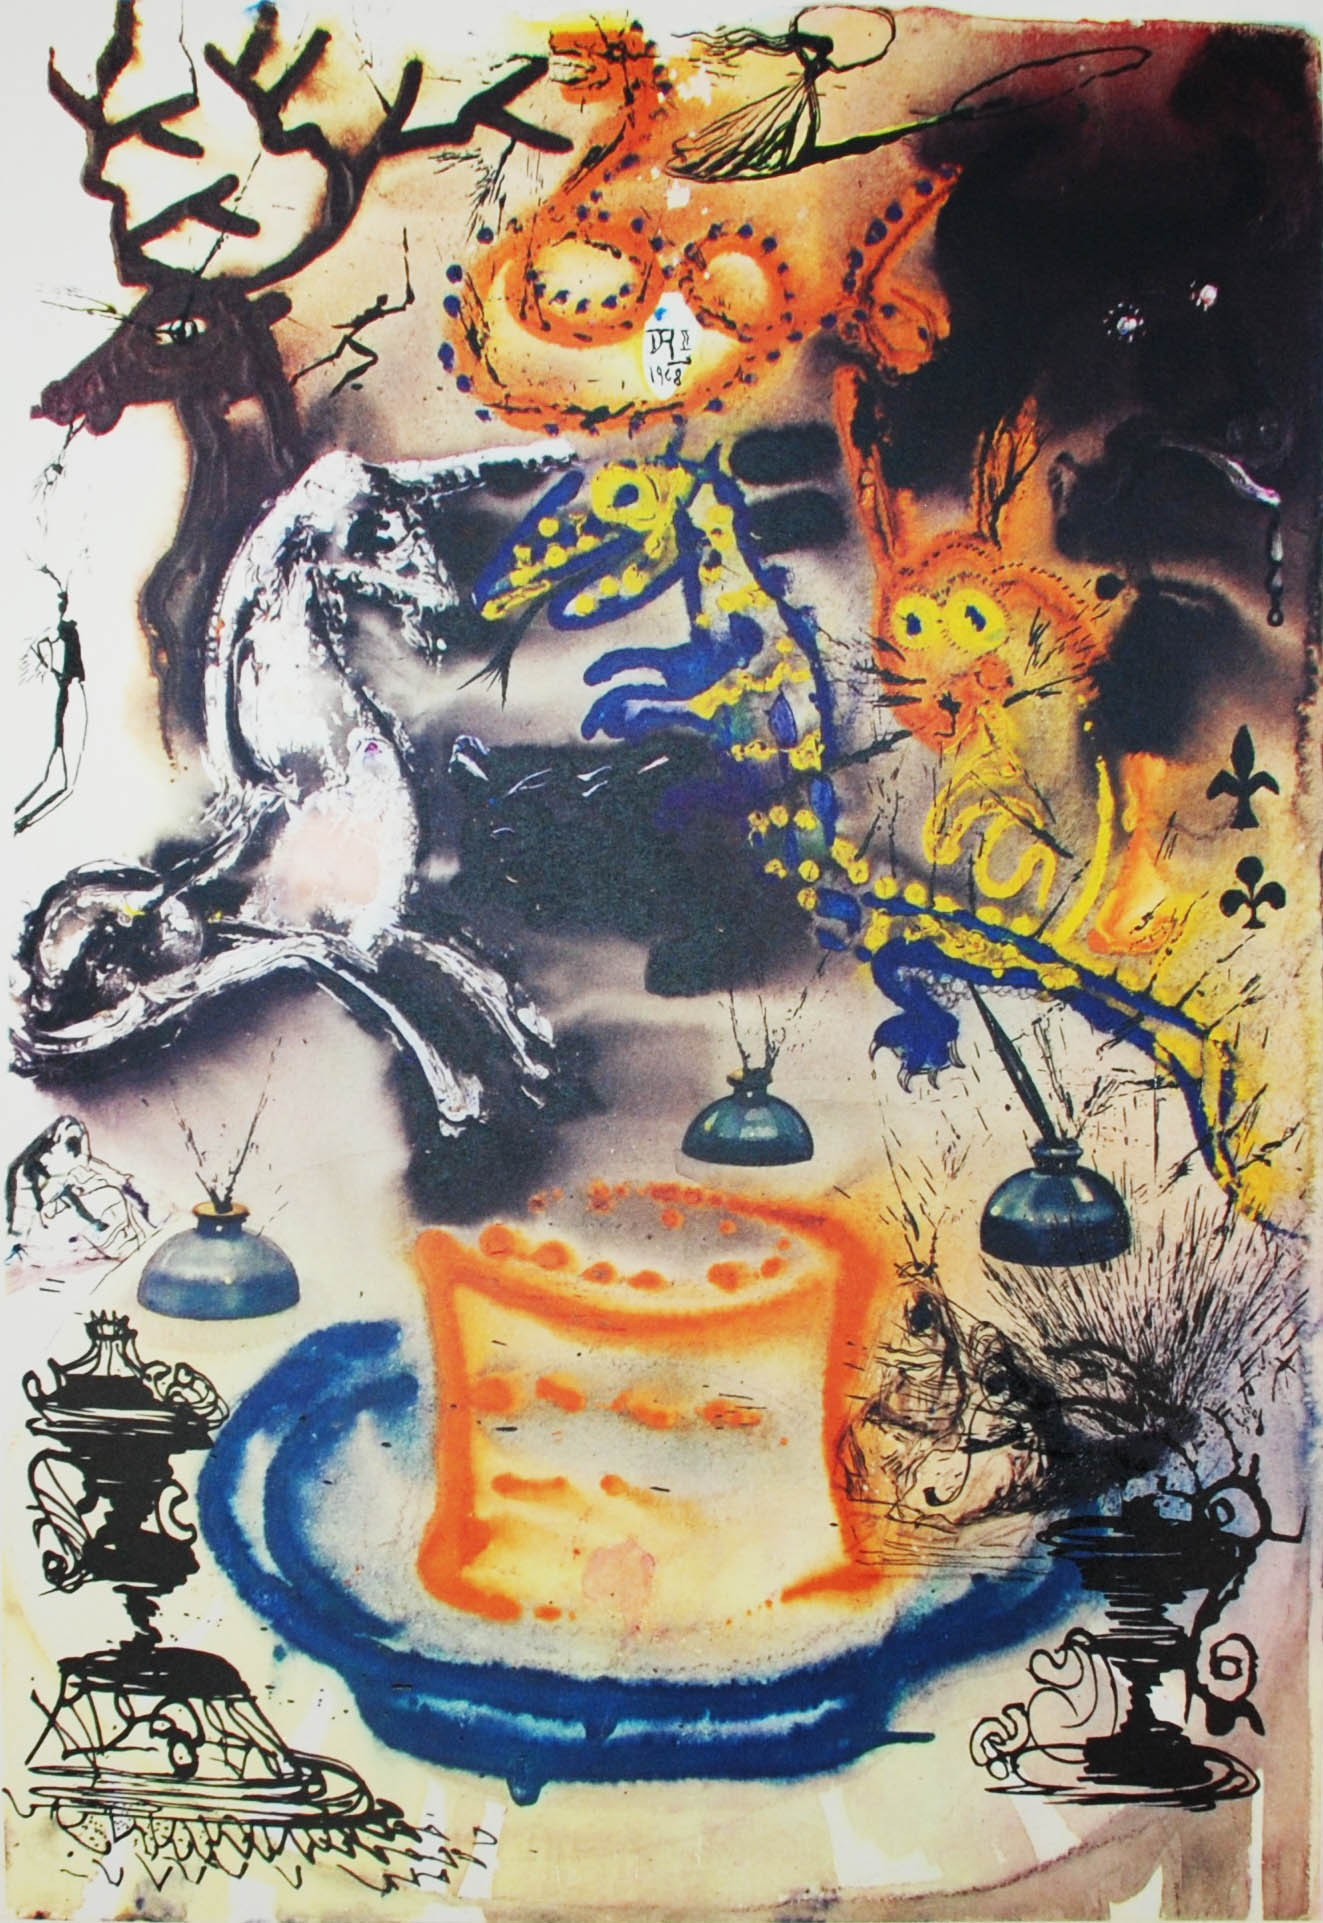 salvador dali, art, qwelly, qwellygraphy, blog, literature, illustration, ilustracia, alice in wonderland, სალვადორ დალი, ილუსტრაცია, დალის ილუსტრაციები, ალისა საოცრებათა ქვეყანაში, ალისა ვონდერლენდში, ქველიბლოგი, მხატვრობა, ხელოვნება